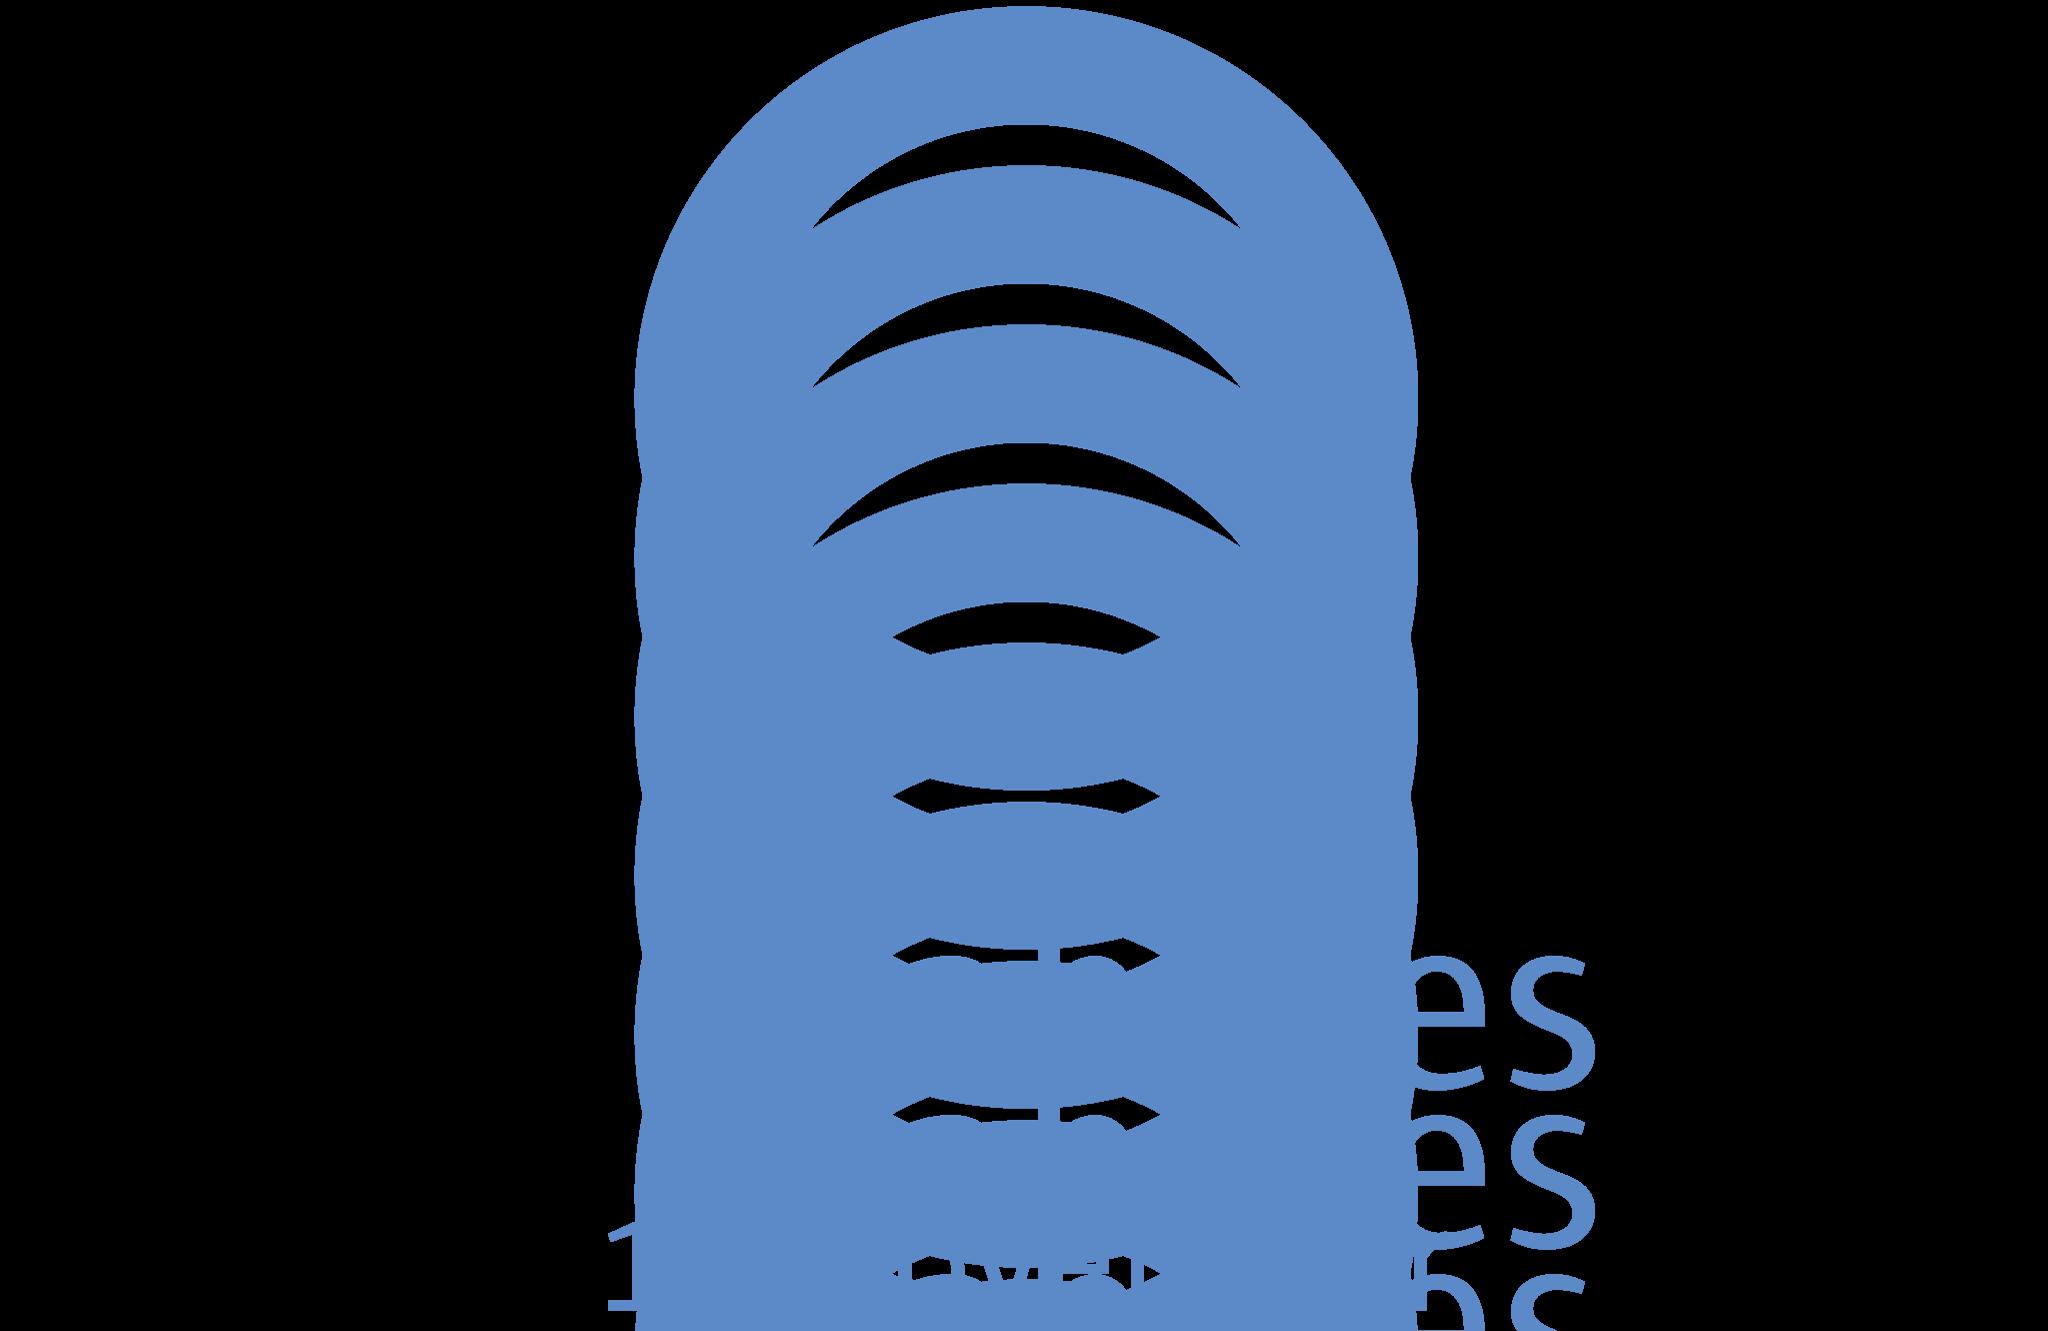 Diabetes clipart diabetes awareness. Index of wp content